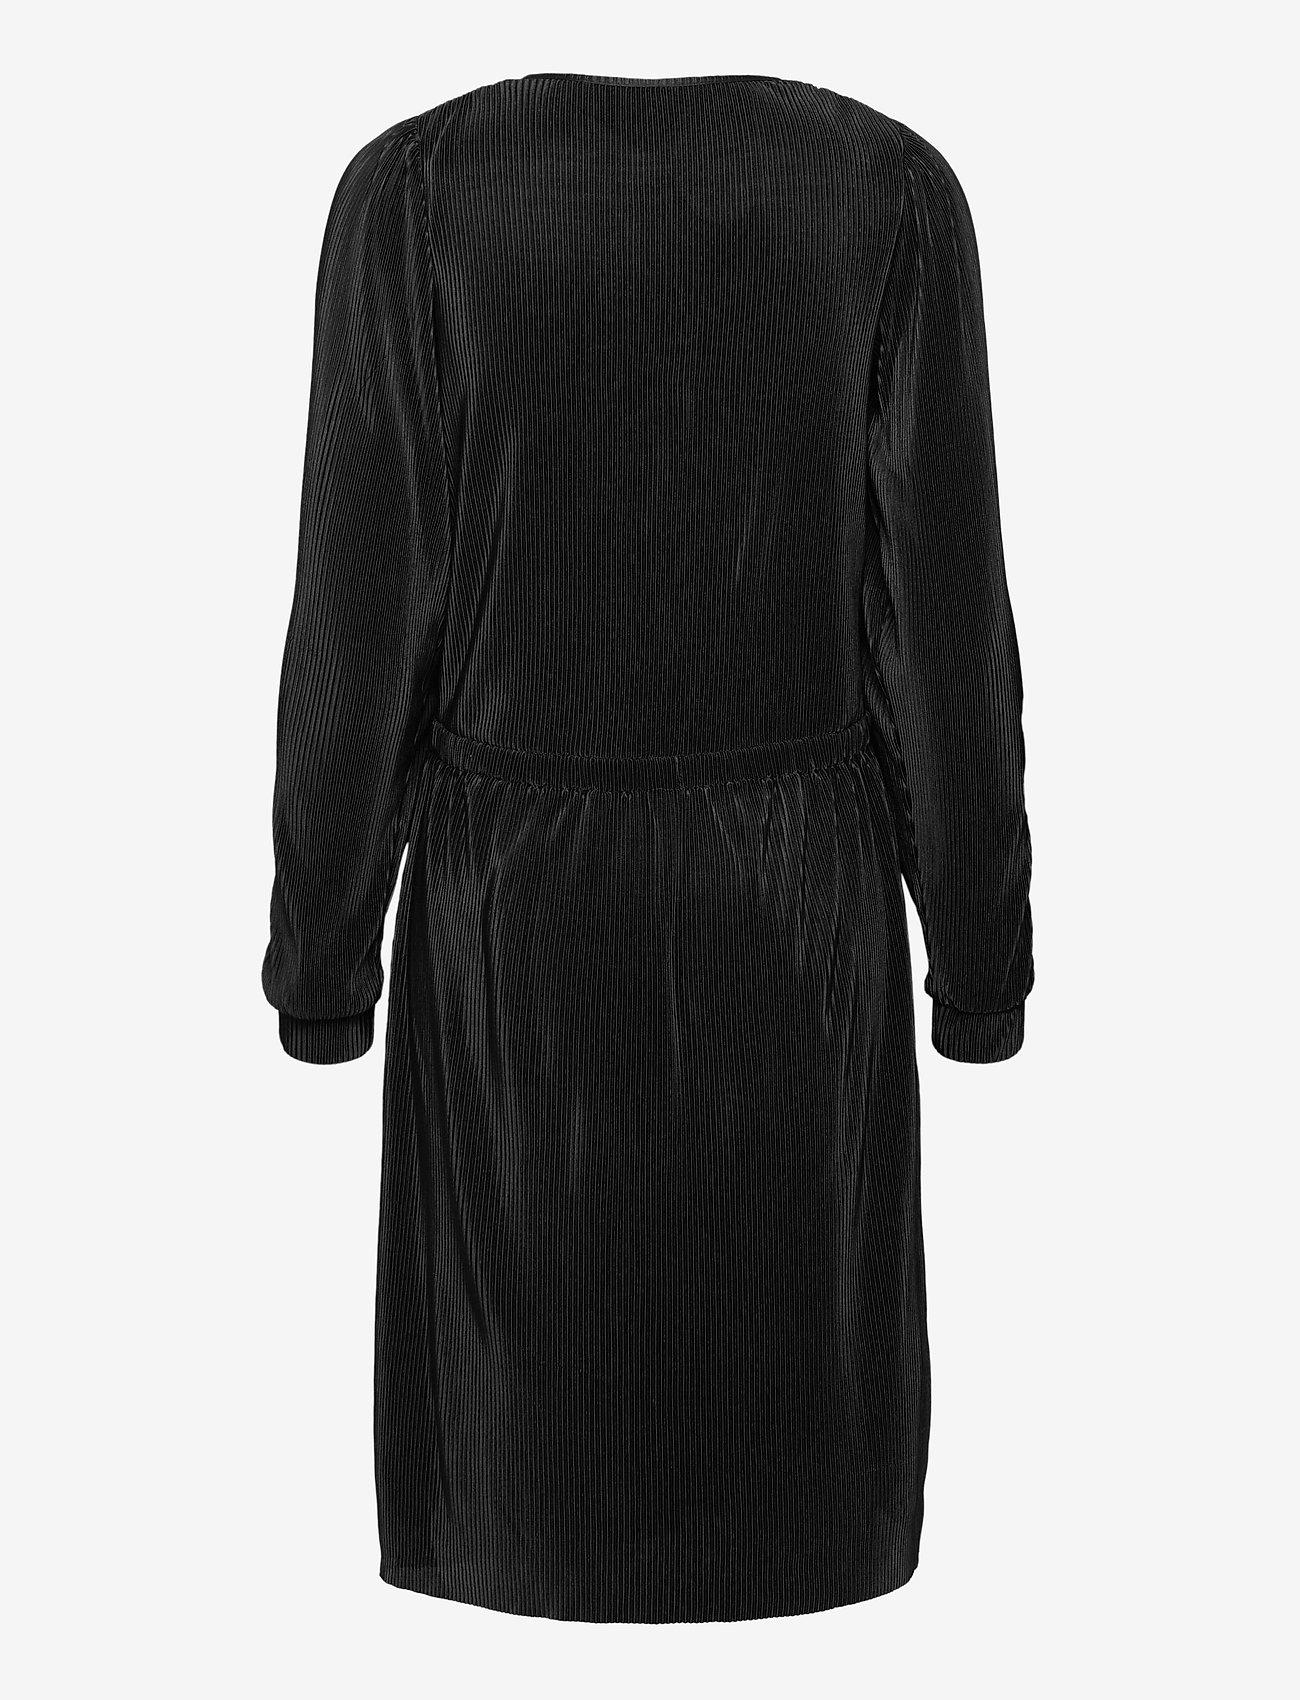 Soyaconcept - SC-NELLIE - midi dresses - black - 1